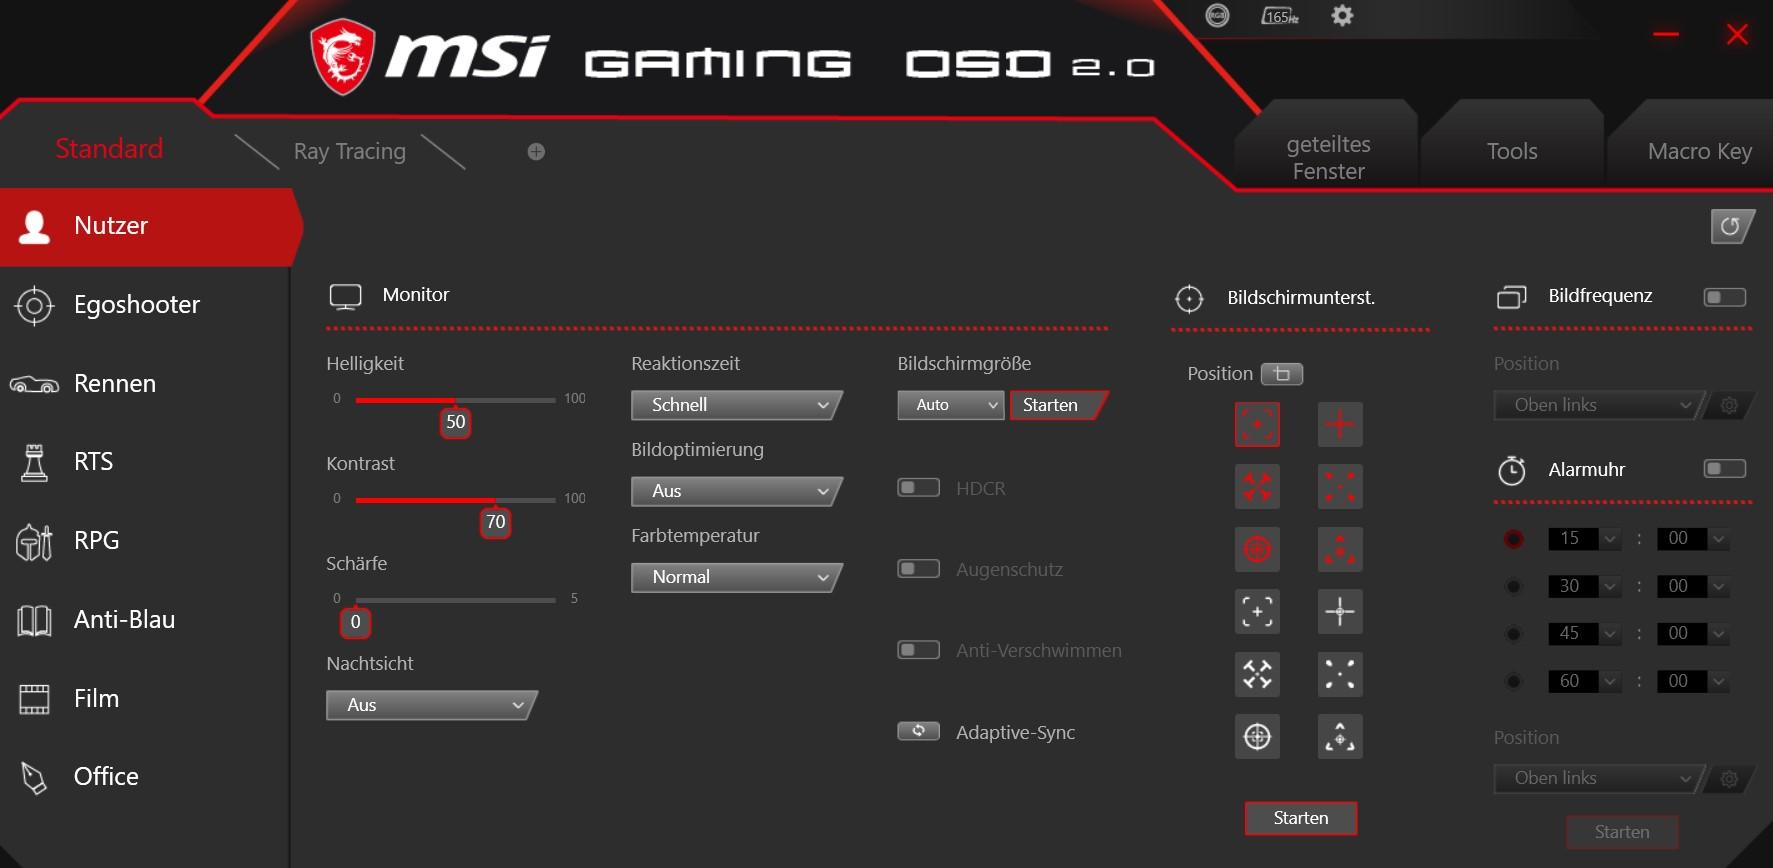 MAG274QRFDE-QD Gaming OSD